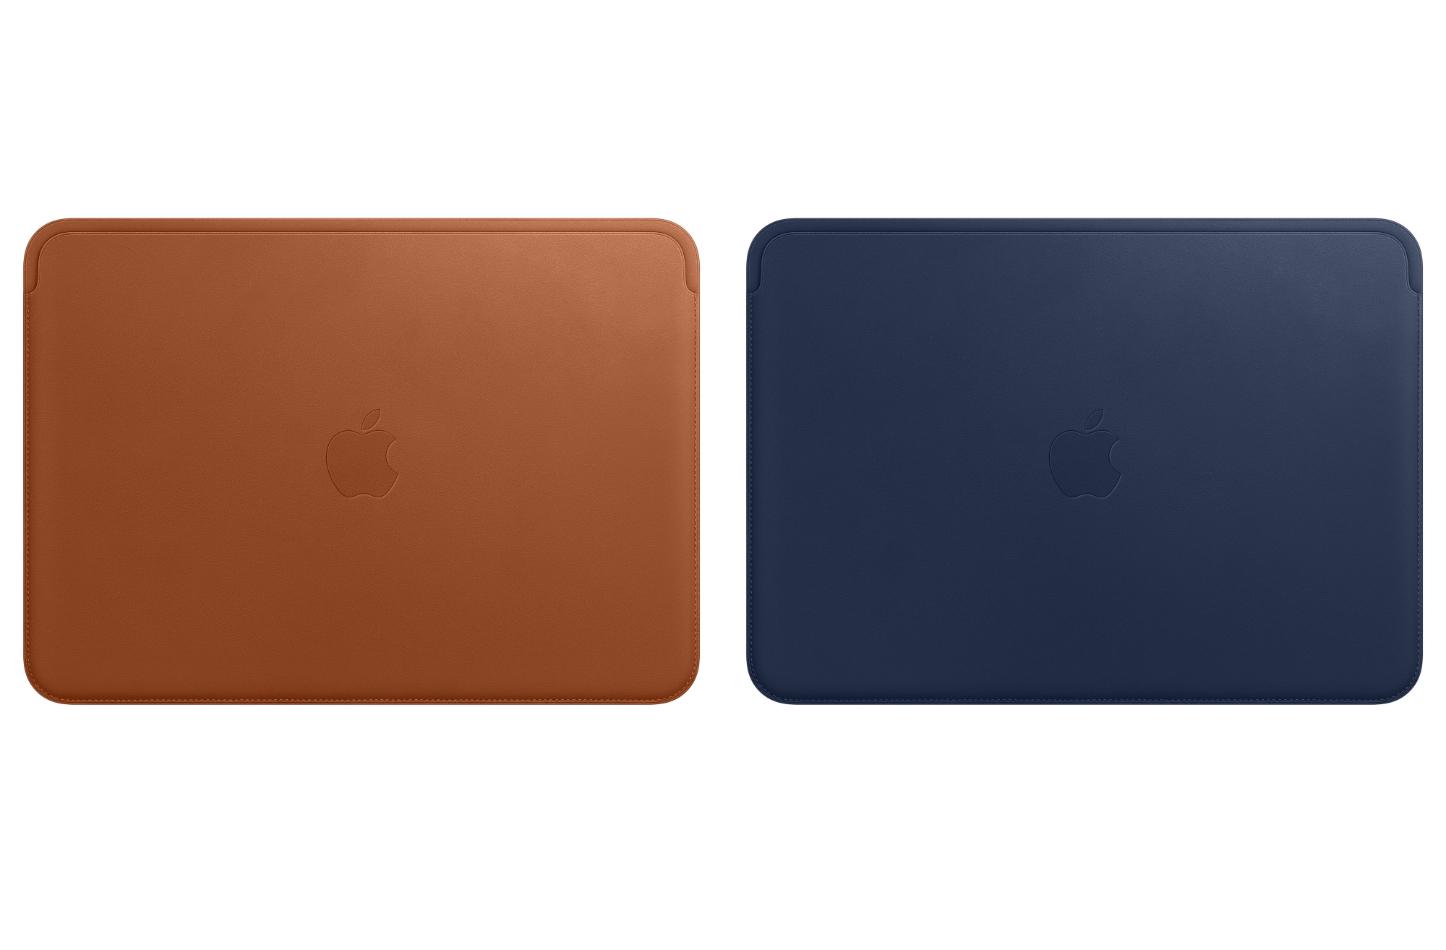 12inch-MacBook-Leather-Sleeve.jpg